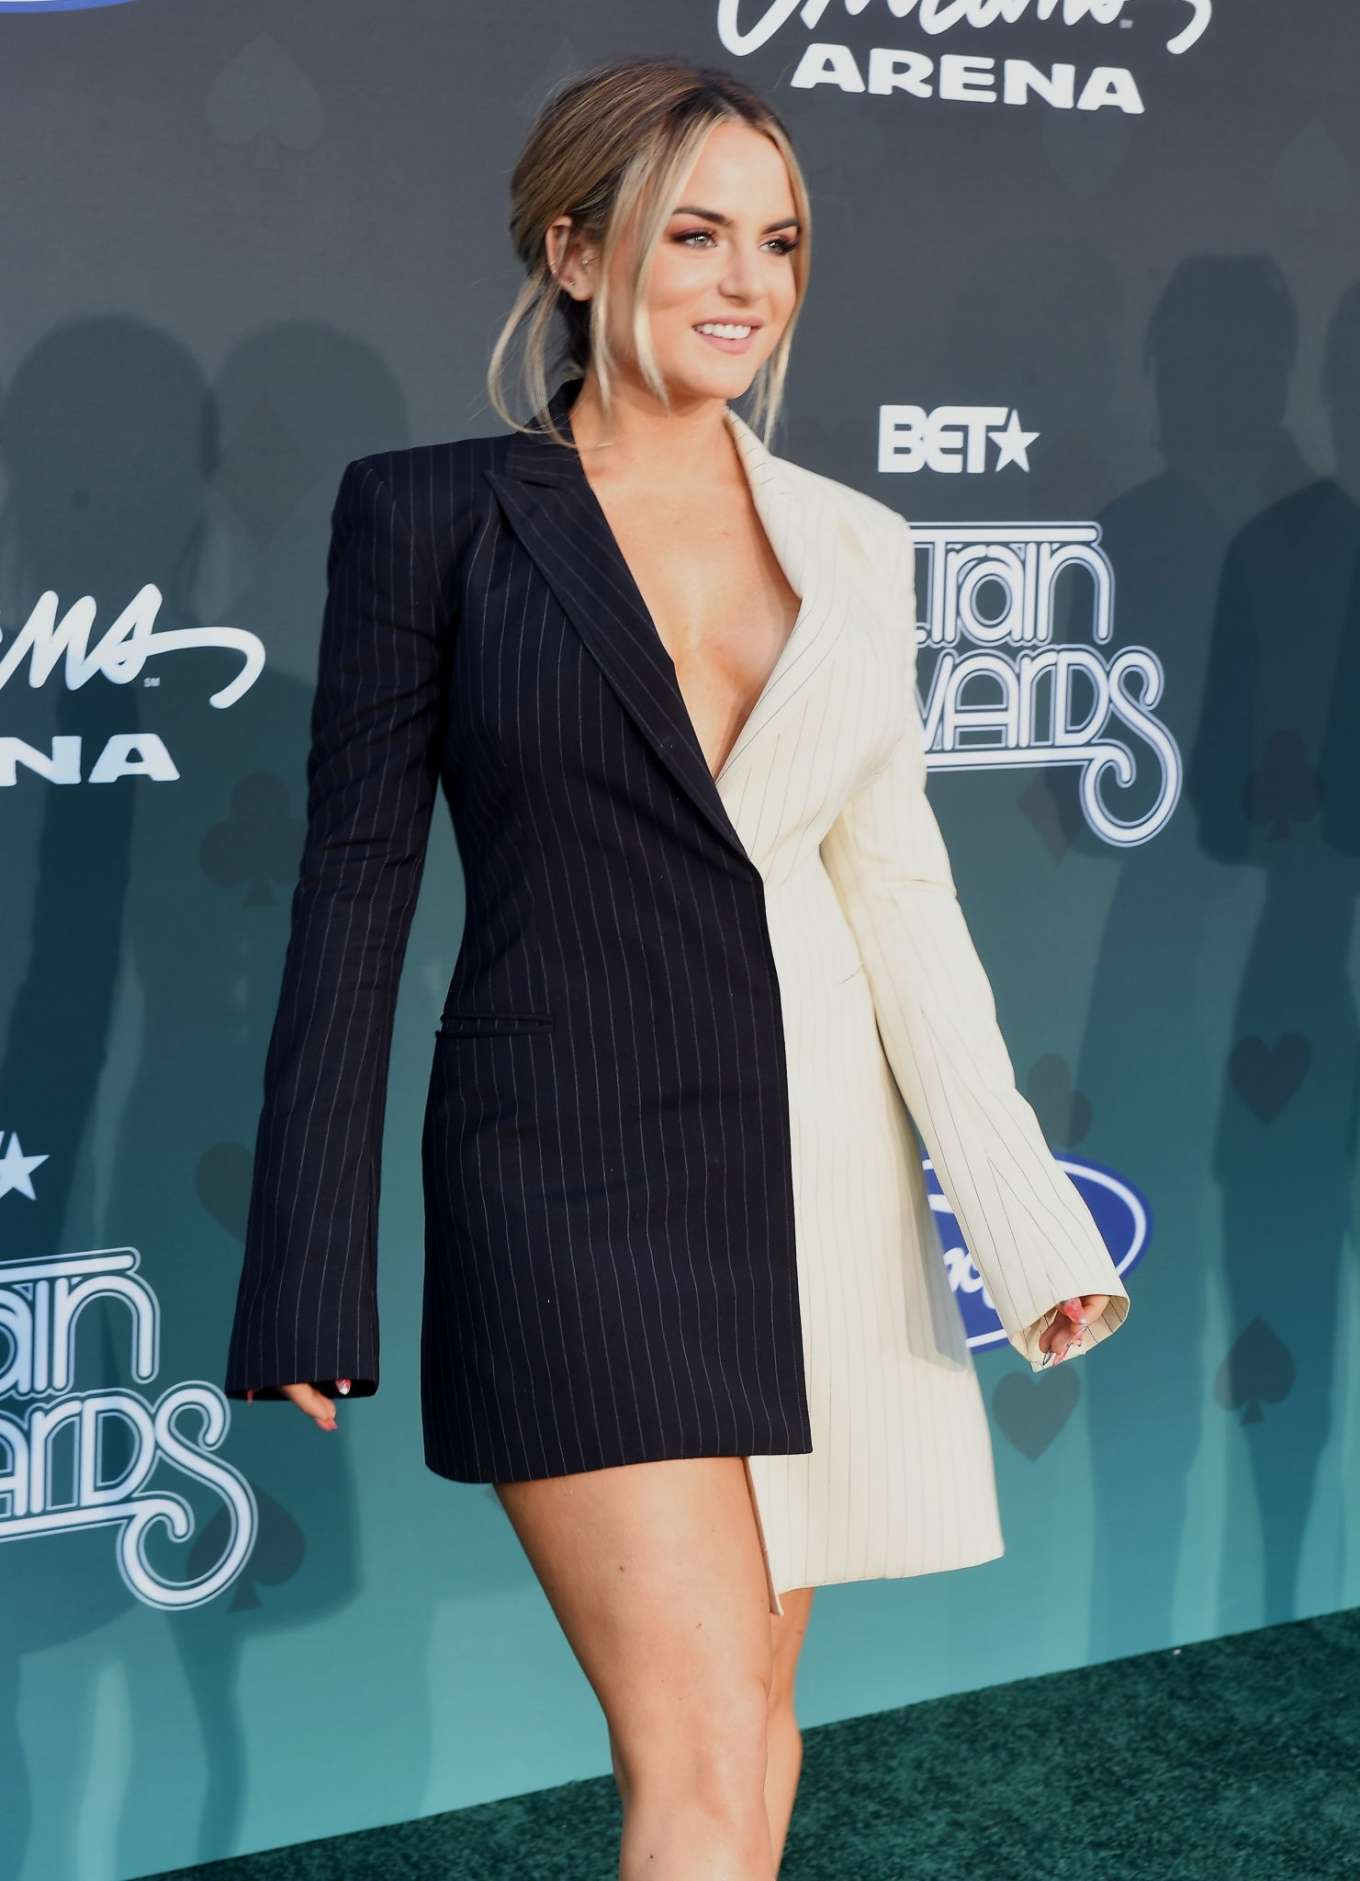 JoJo Levesque 2019 : Jojo Levesque – 2019 BET Soul Train Awards in Las Vegas-07